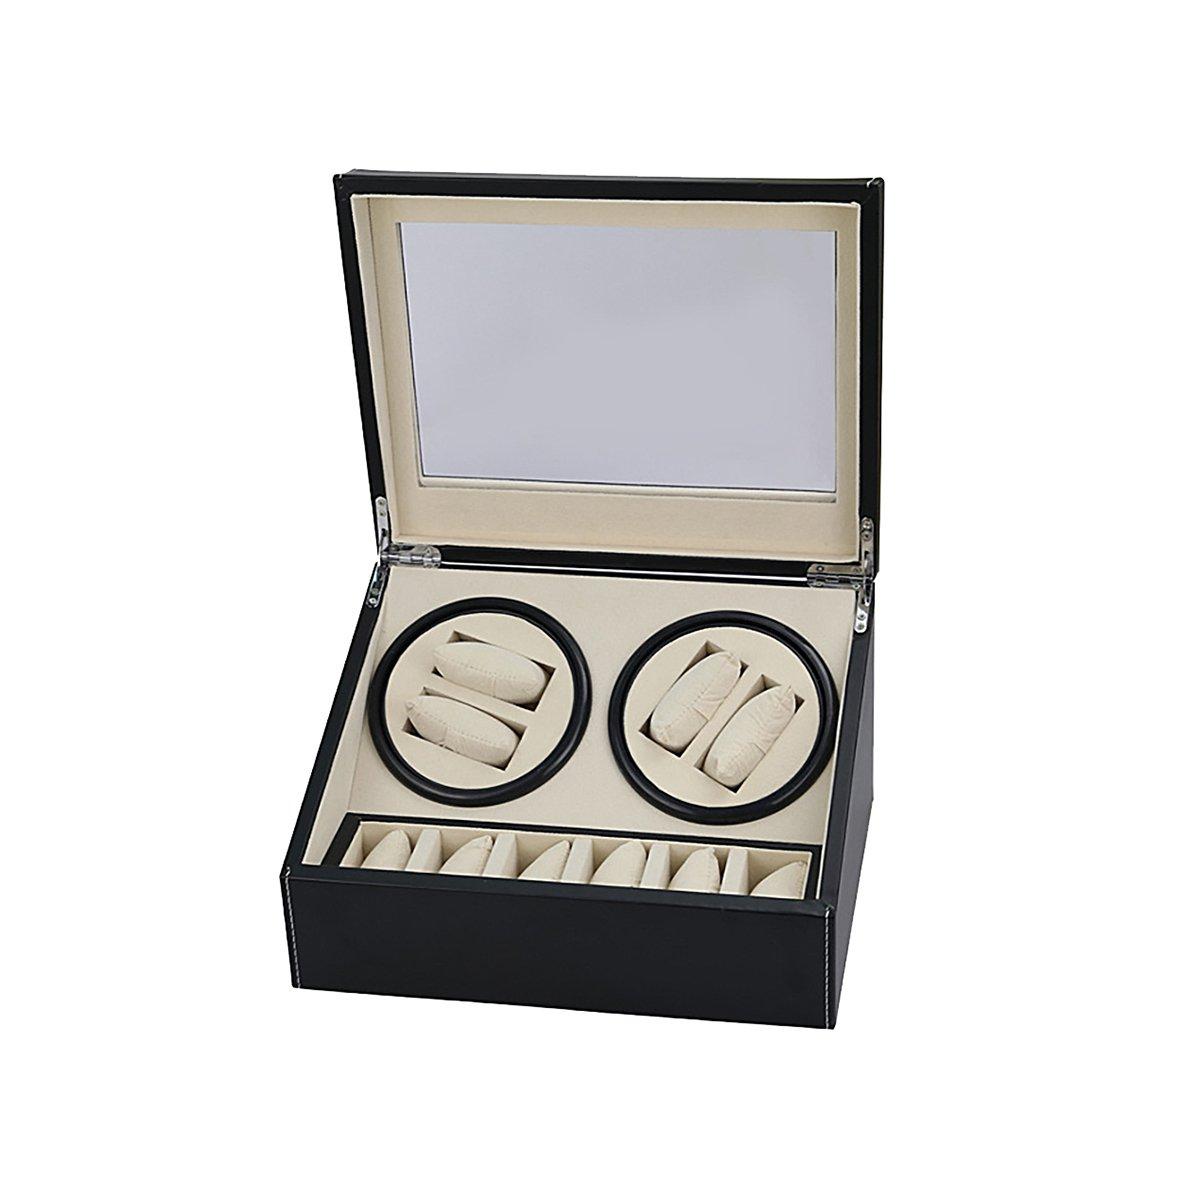 HooAMI Leather Automatic Rotation 4+6 Watch Winder Storage Case Display Box